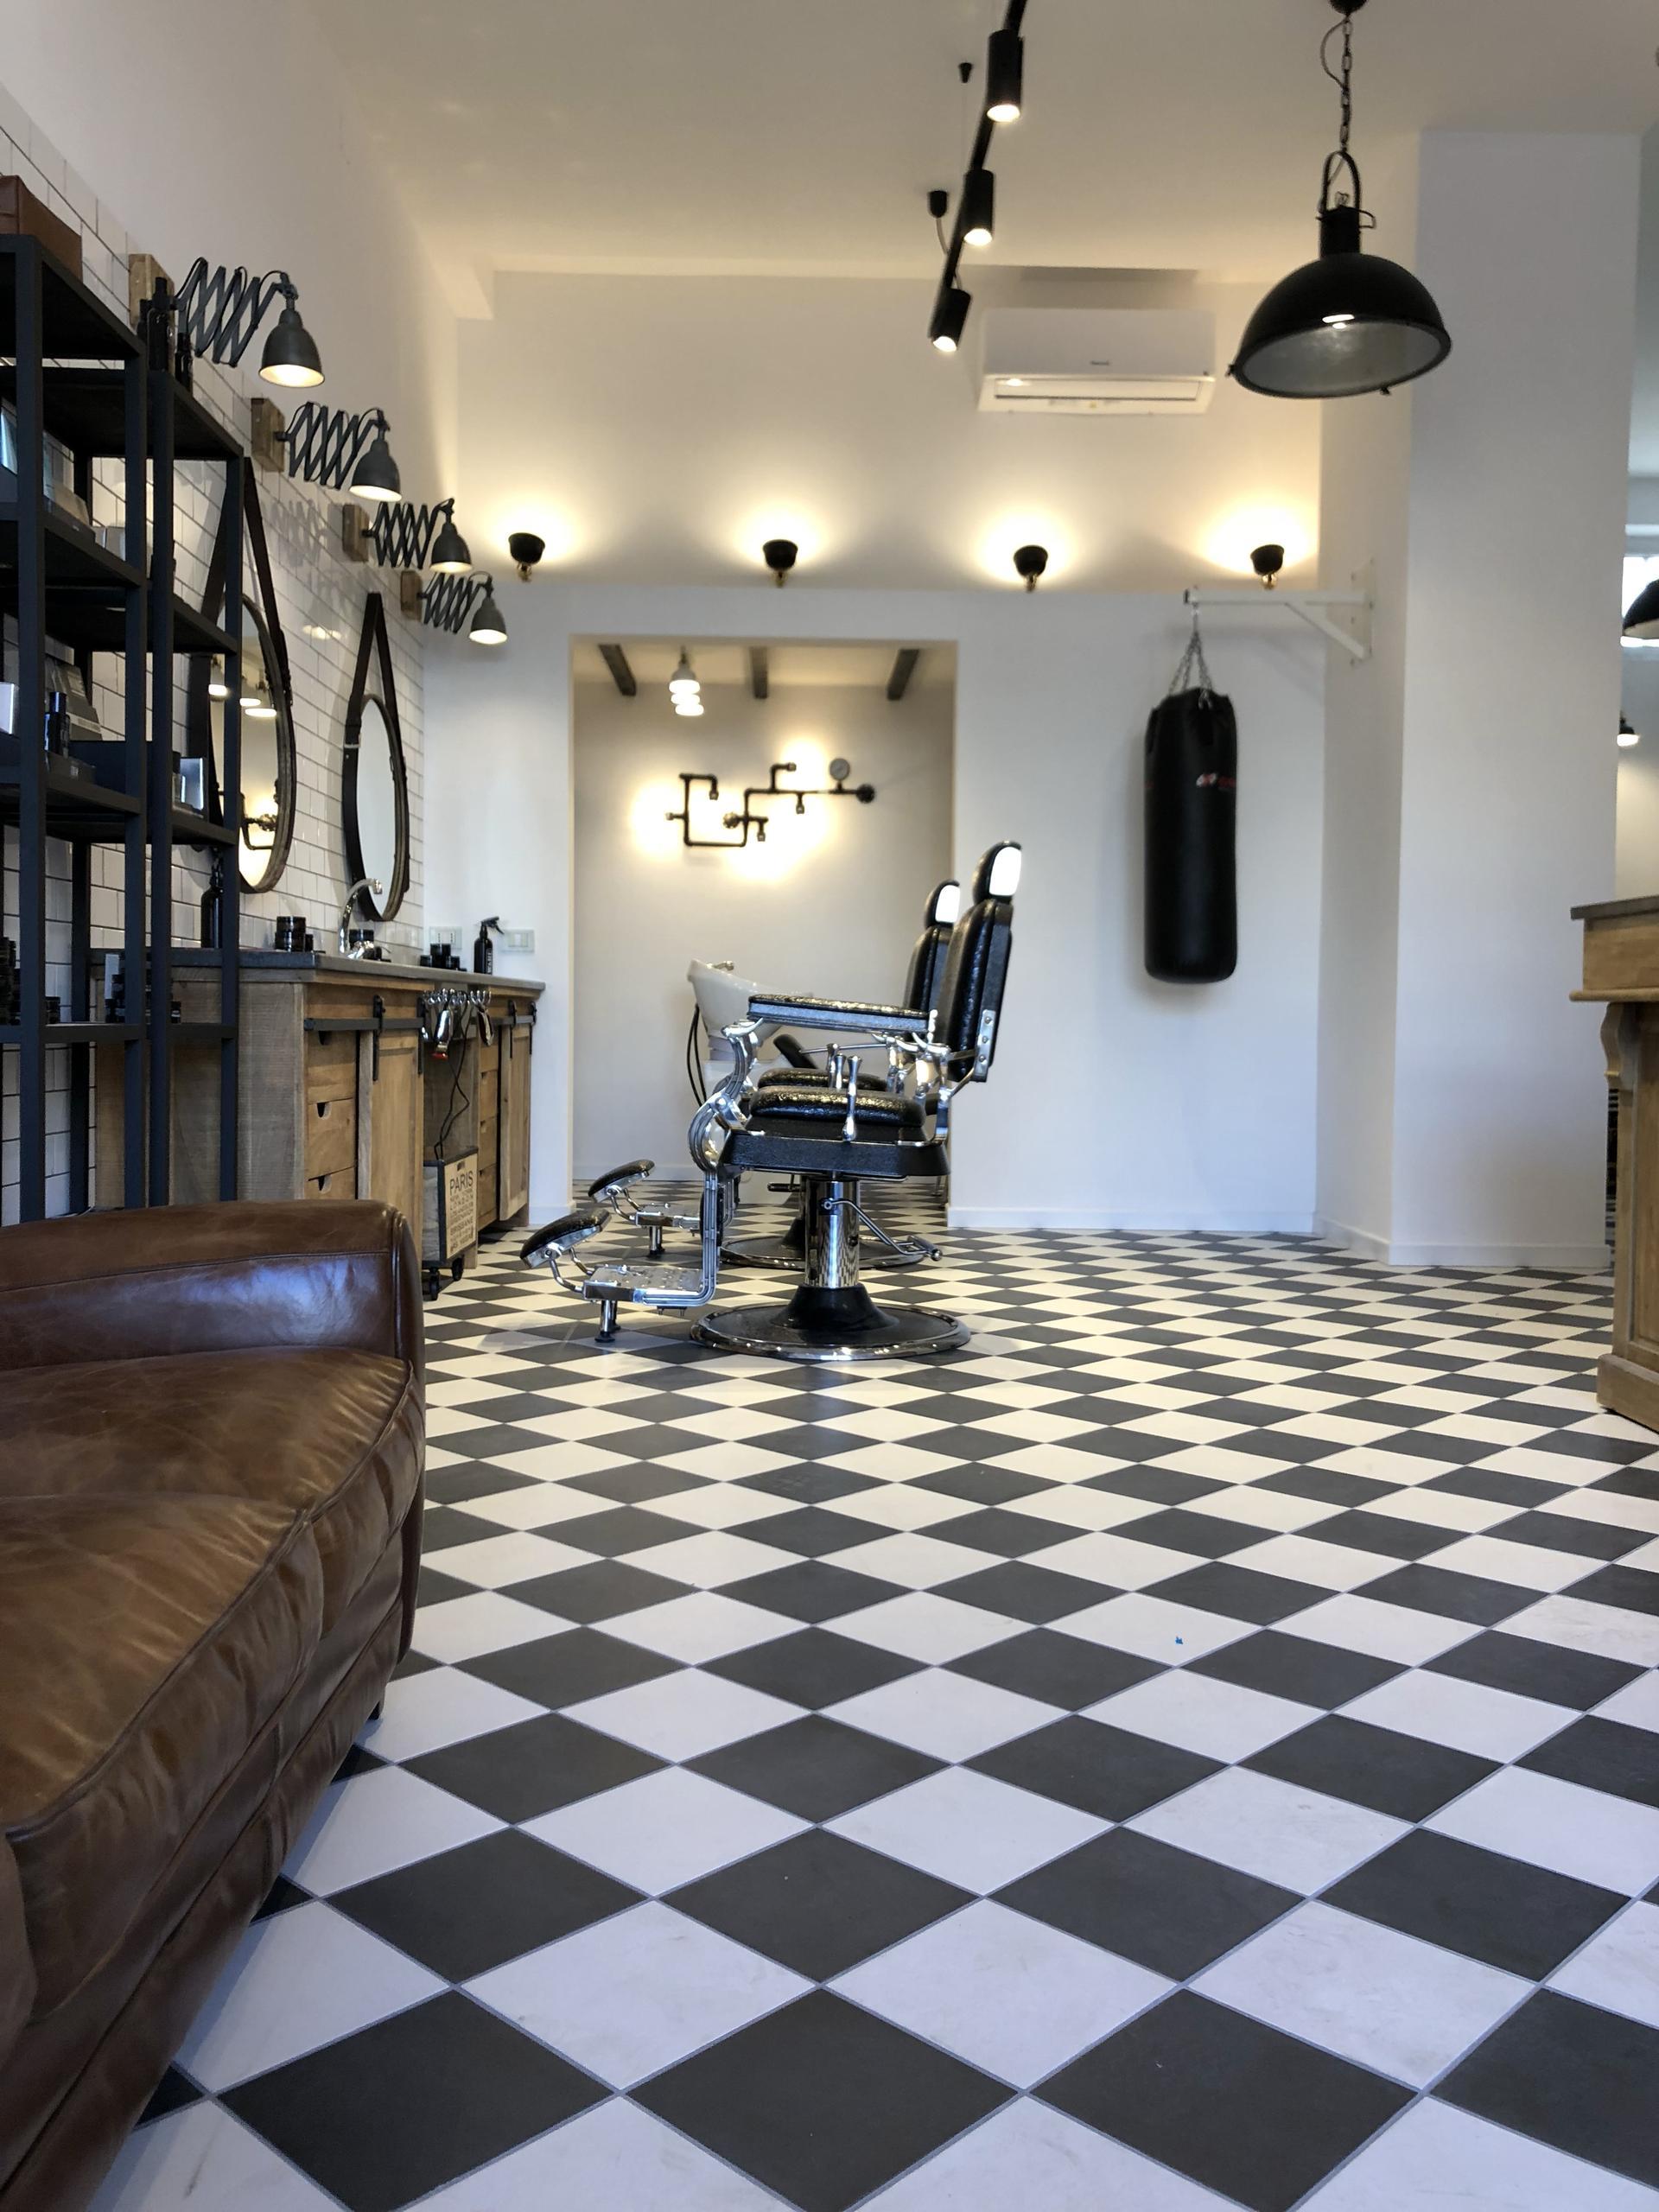 Piastrelle in stile vintage per il barbershop a taranto - Piastrelle vintage ...